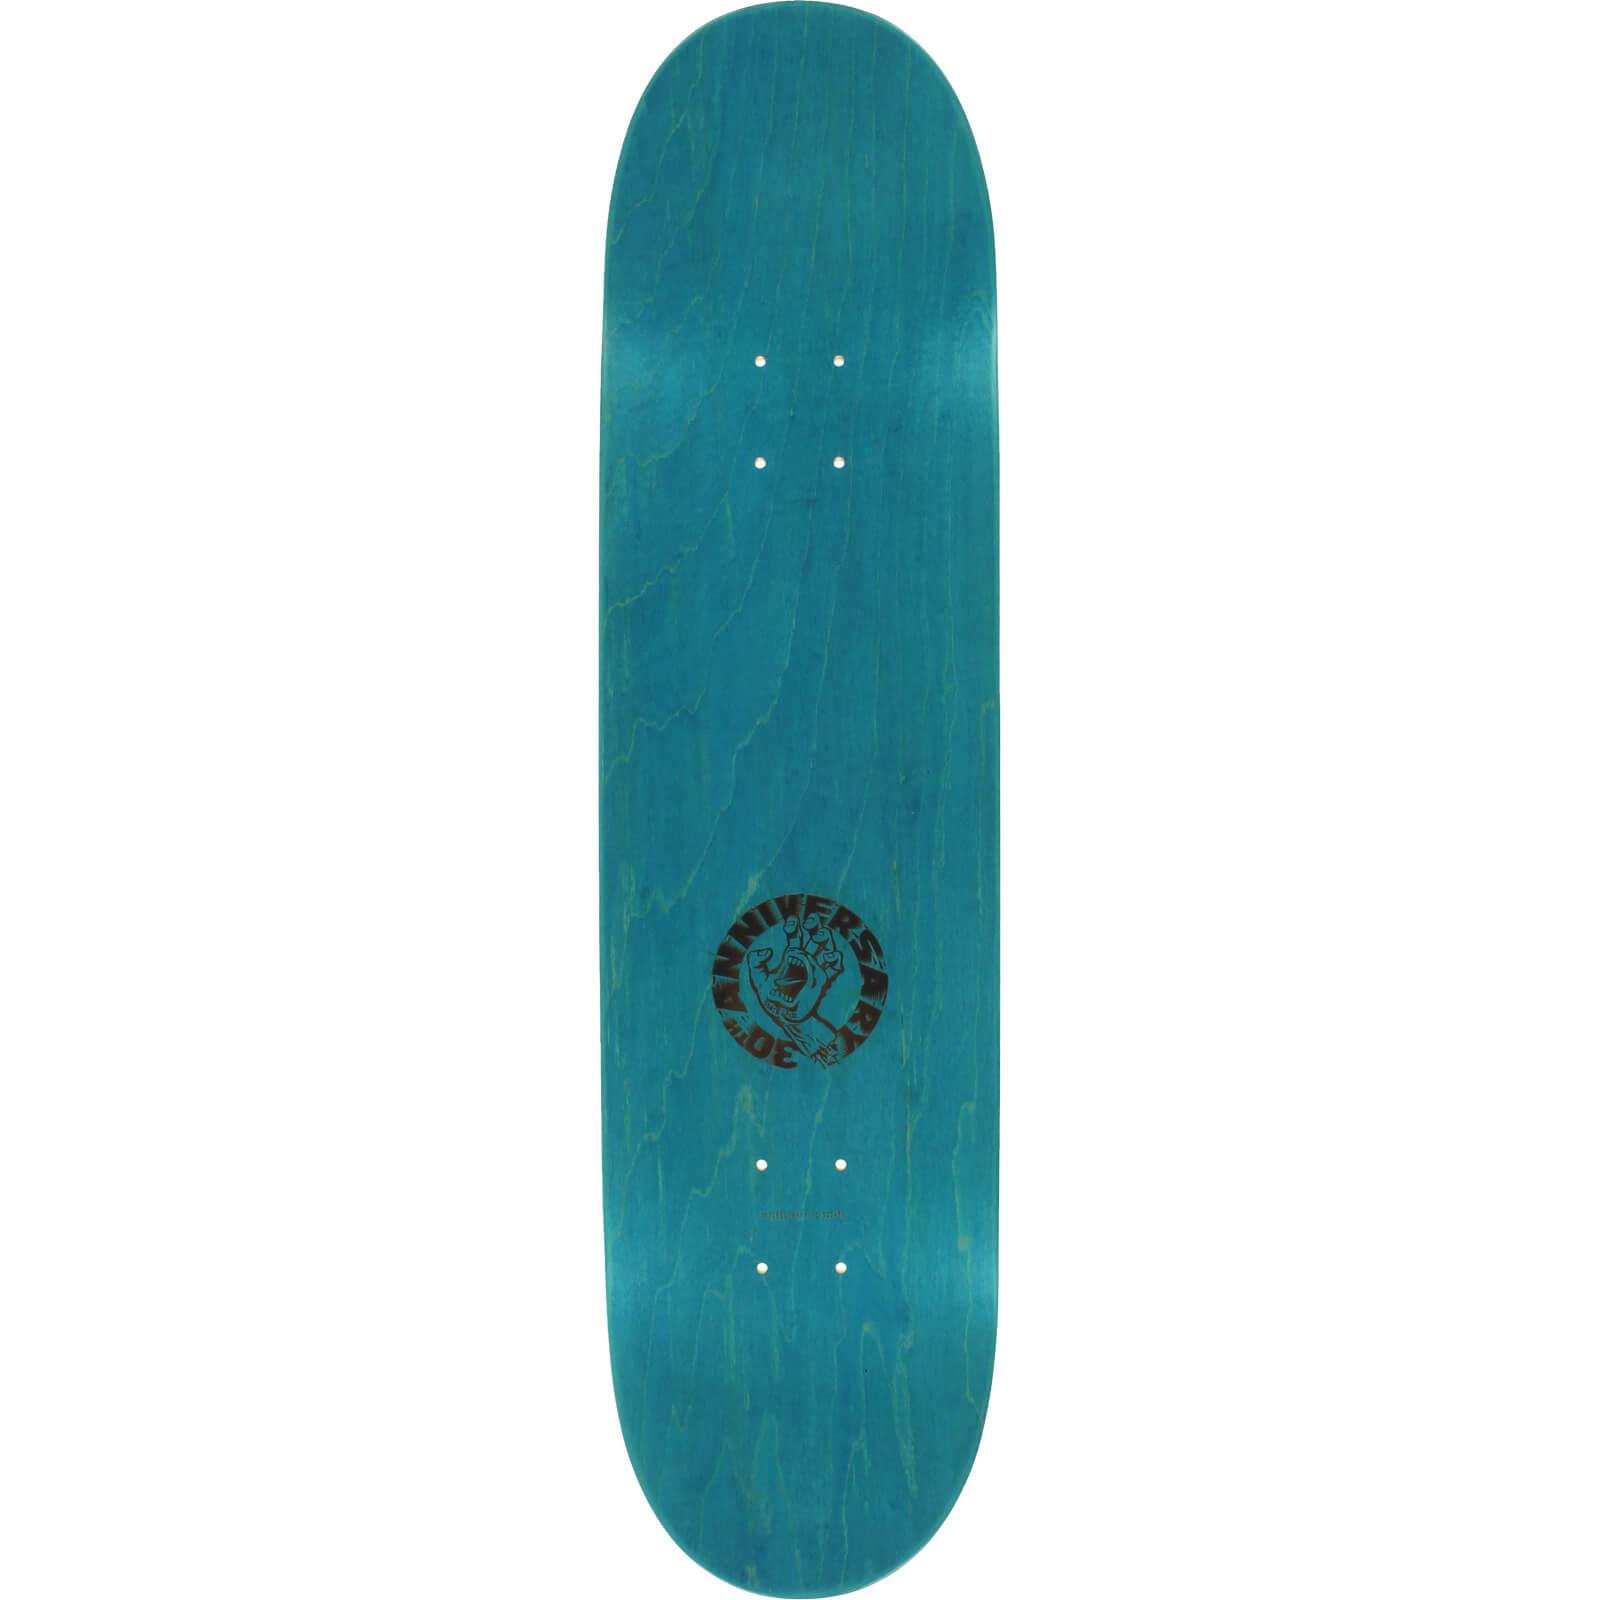 Santa Cruz Skateboards Cliver Hand Skateboard Deck 8 5 X